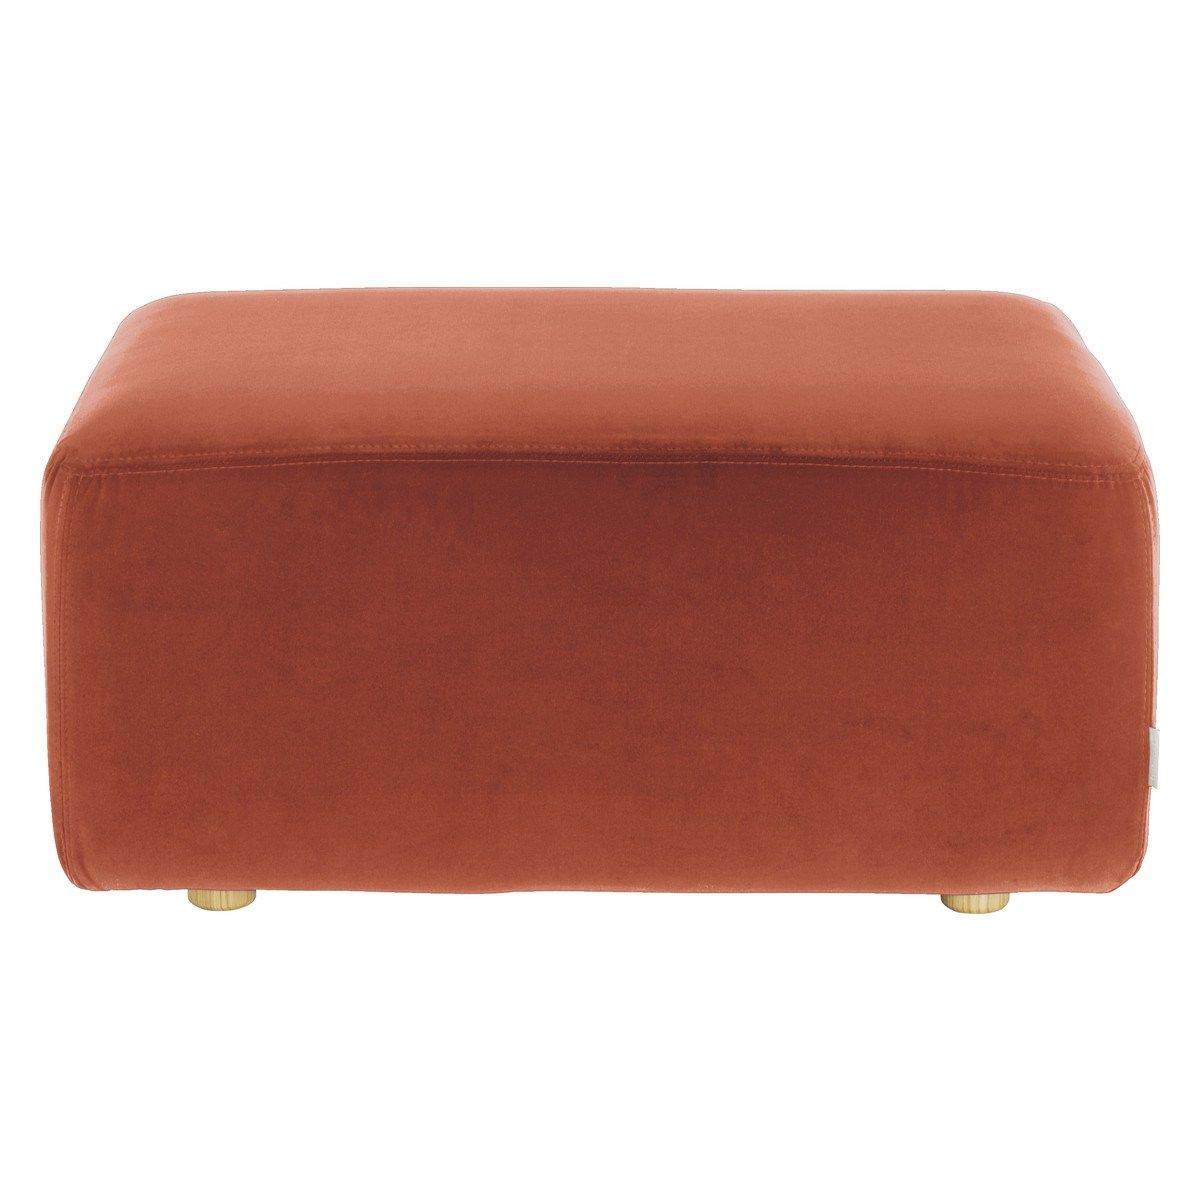 Habitat louis orange velvet fabric footstool with images